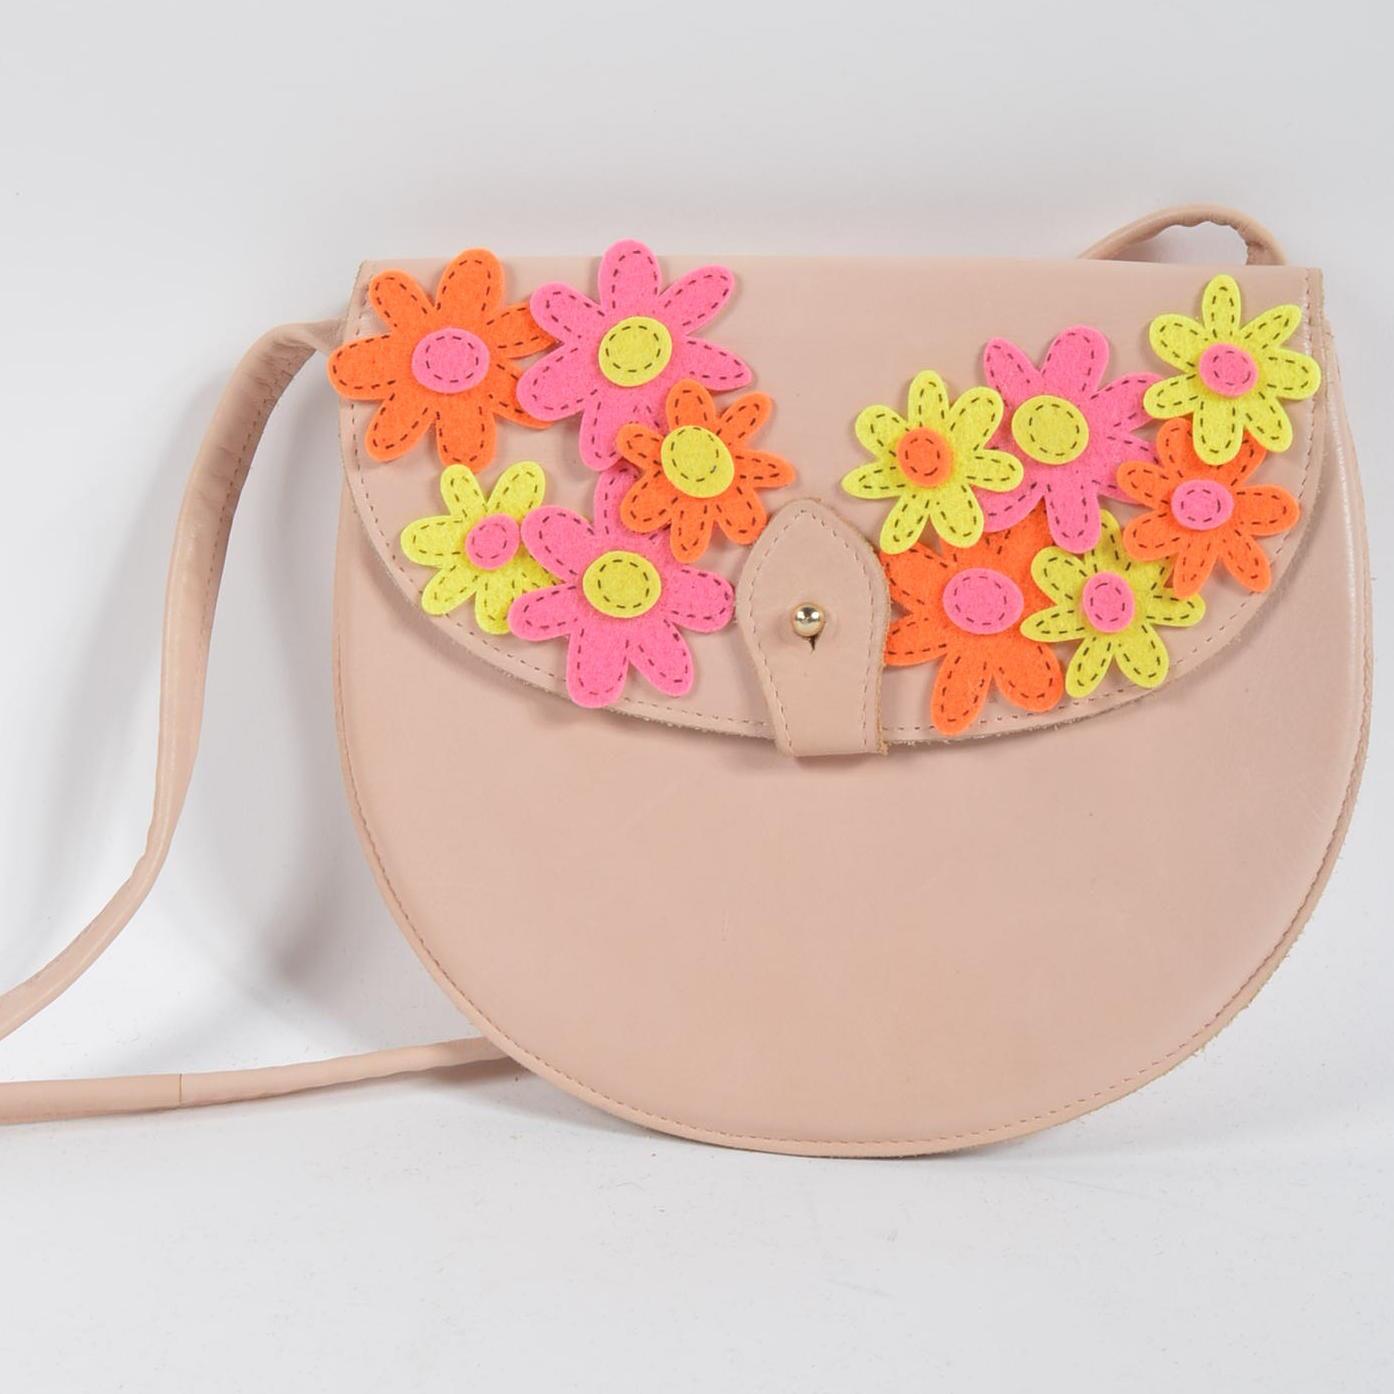 Vintage Charles Jourdan Leather Handbag with Embellishments